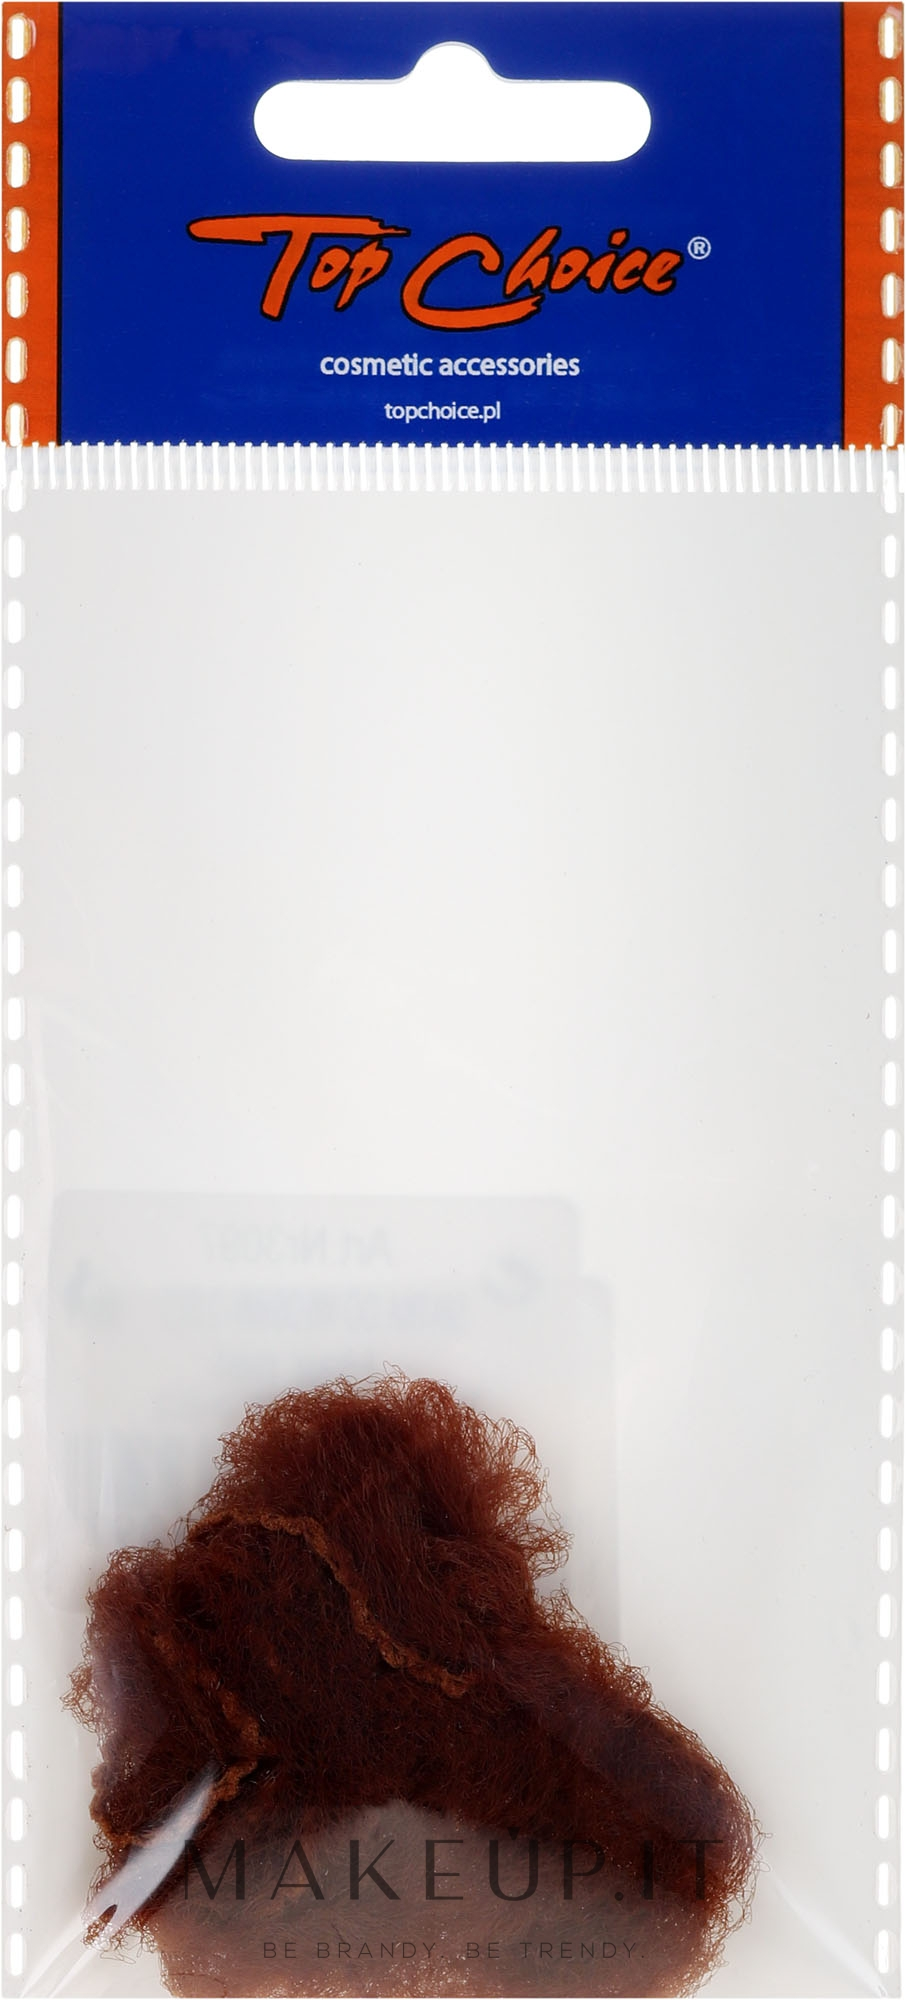 Retina per capelli, 3097, marrone - Top Choice — foto 2 pz.